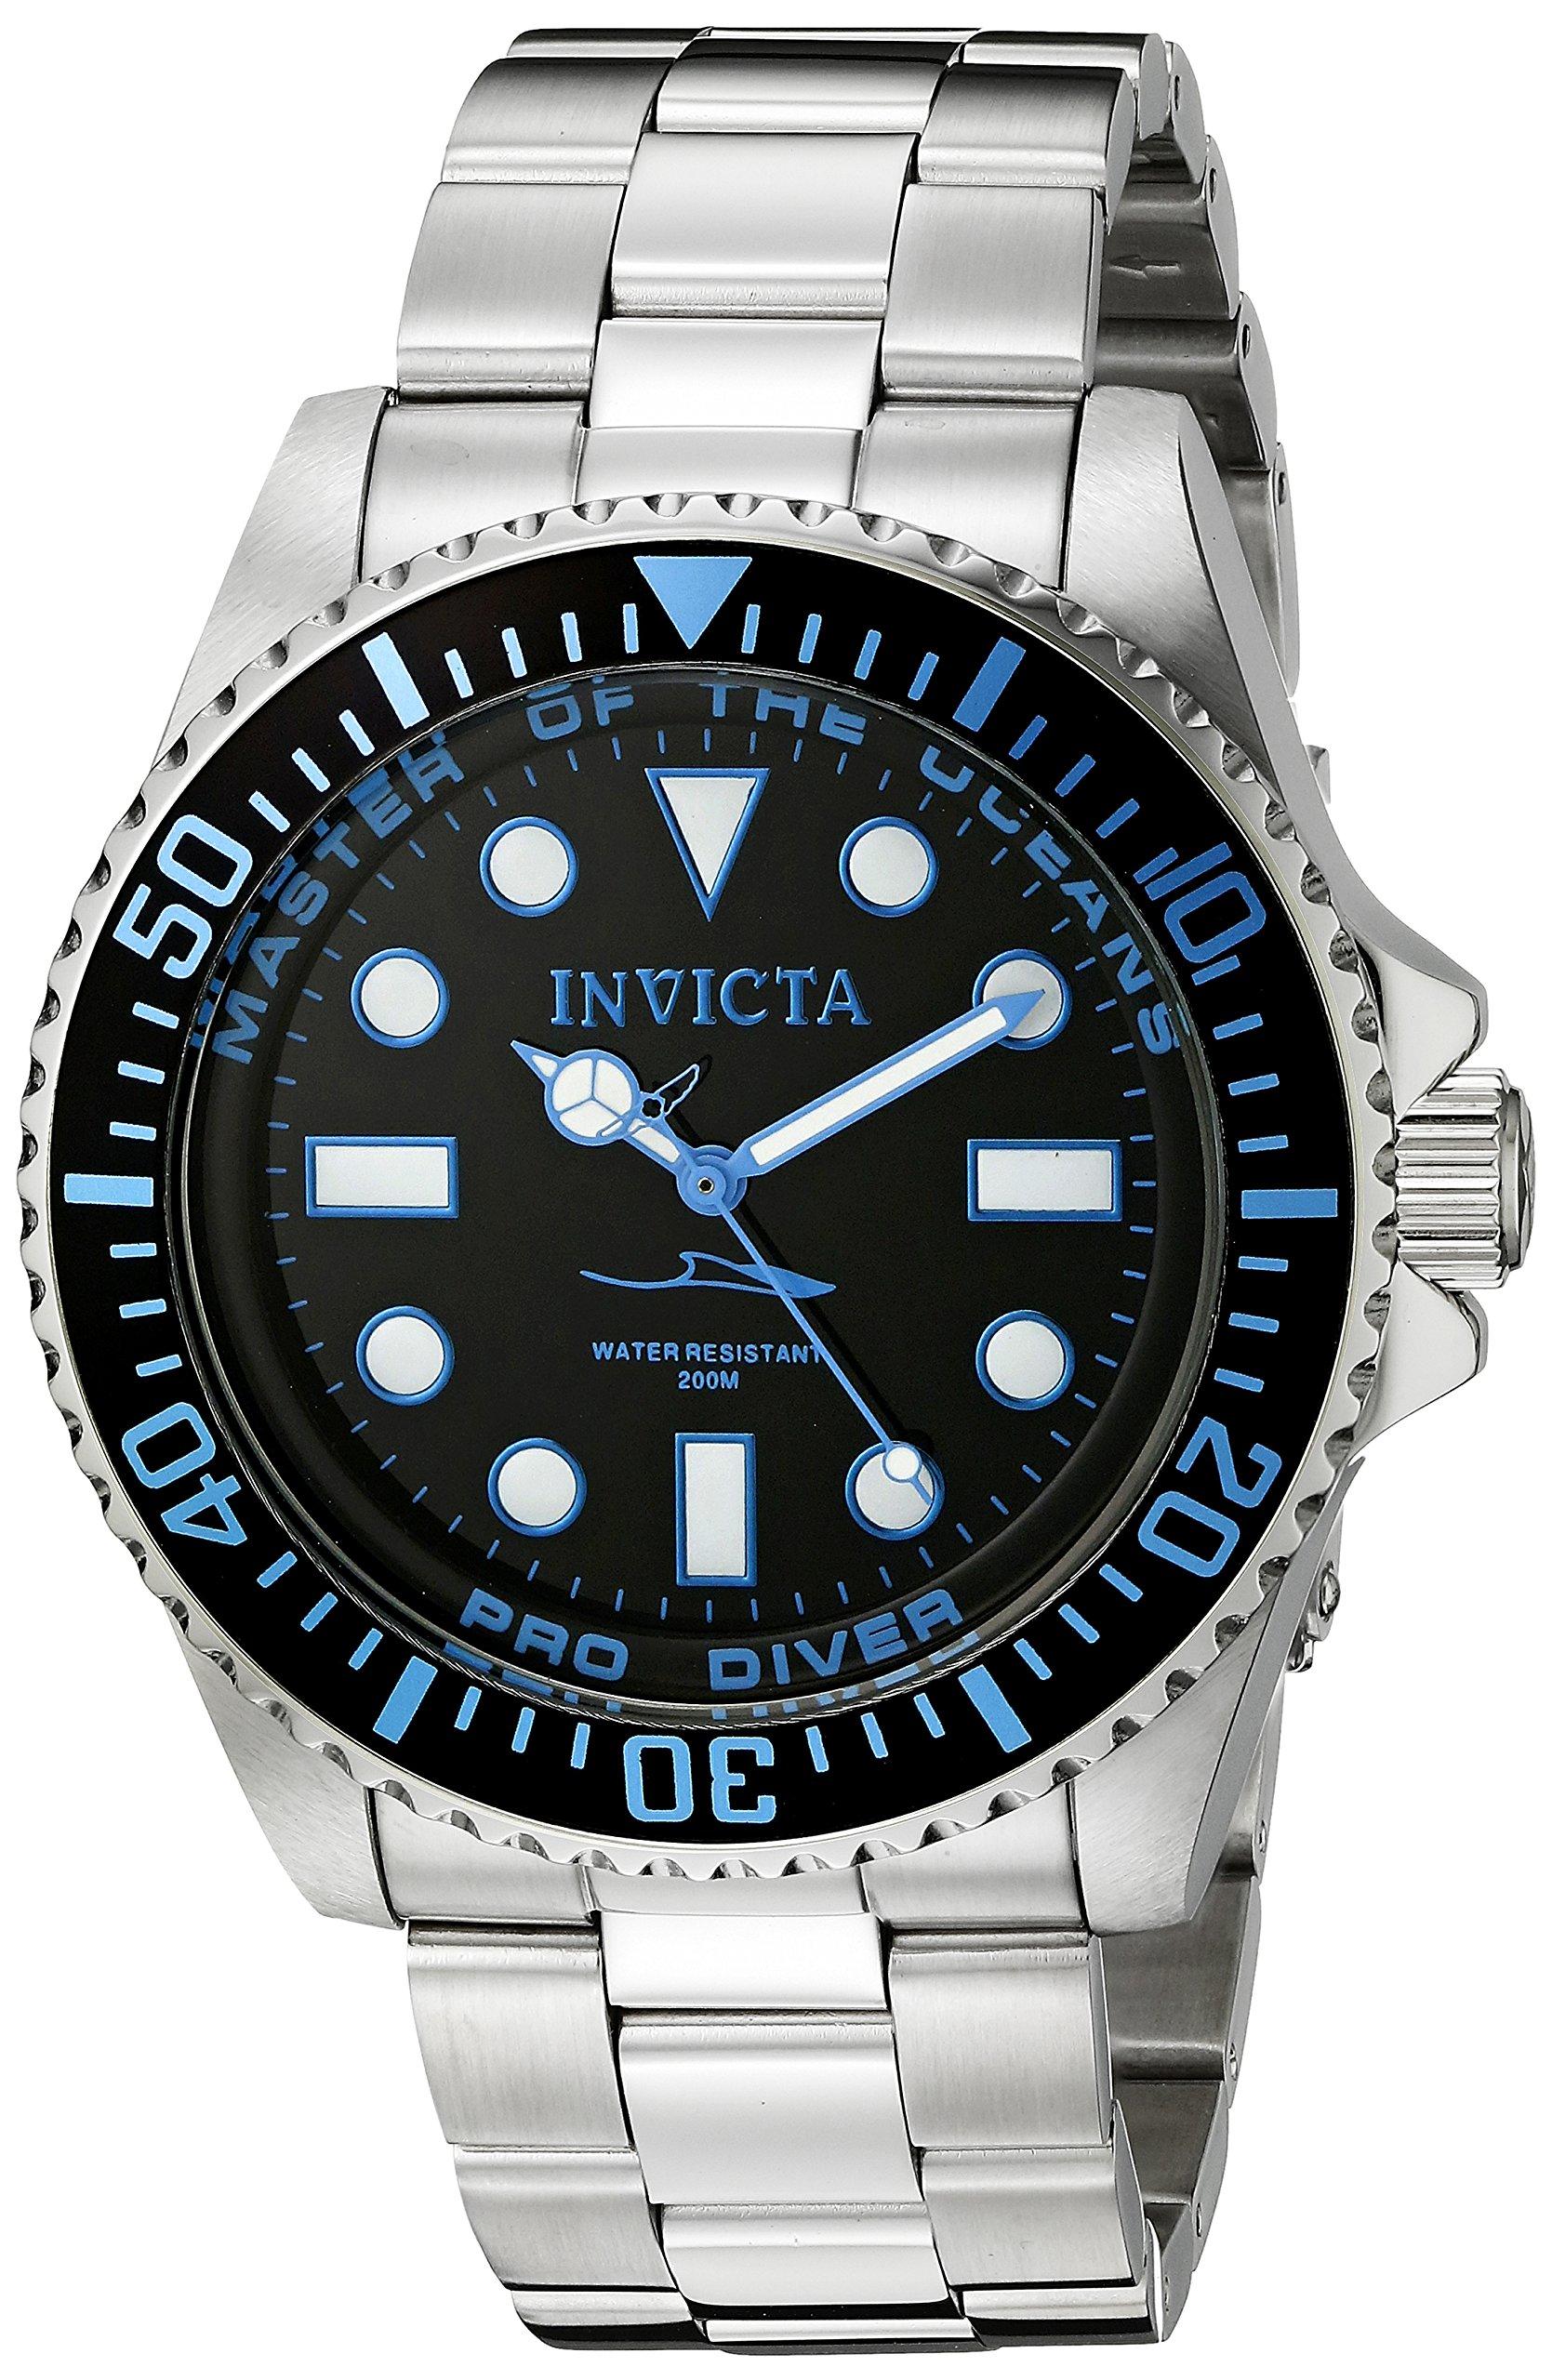 Invicta 20122 Pro Diver Reloj para Hombre acero inoxidable Cuarzo Esfera negro